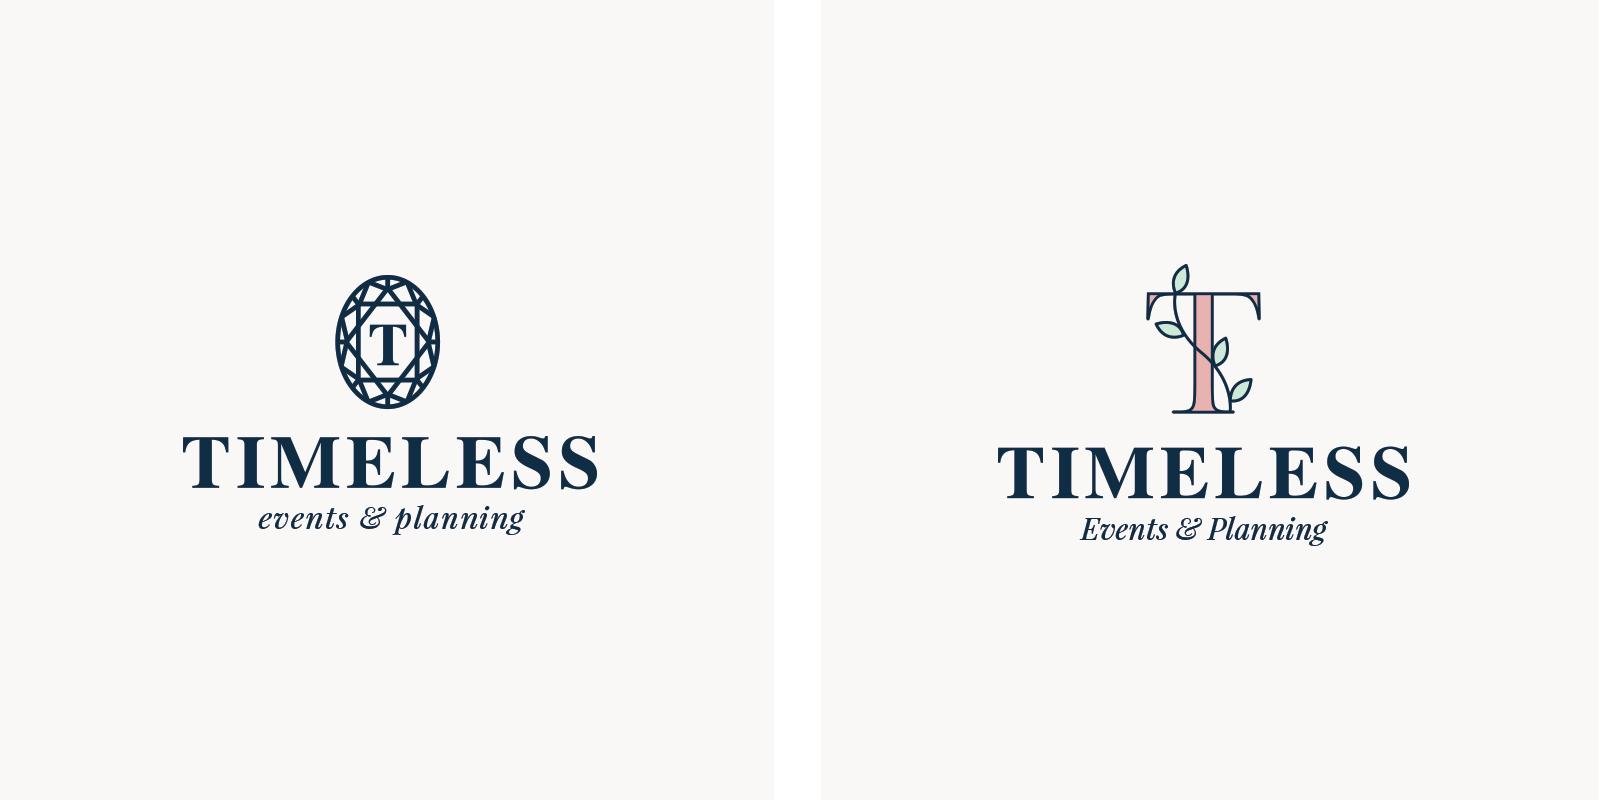 Timeless Events & Planning - alternate logo designs